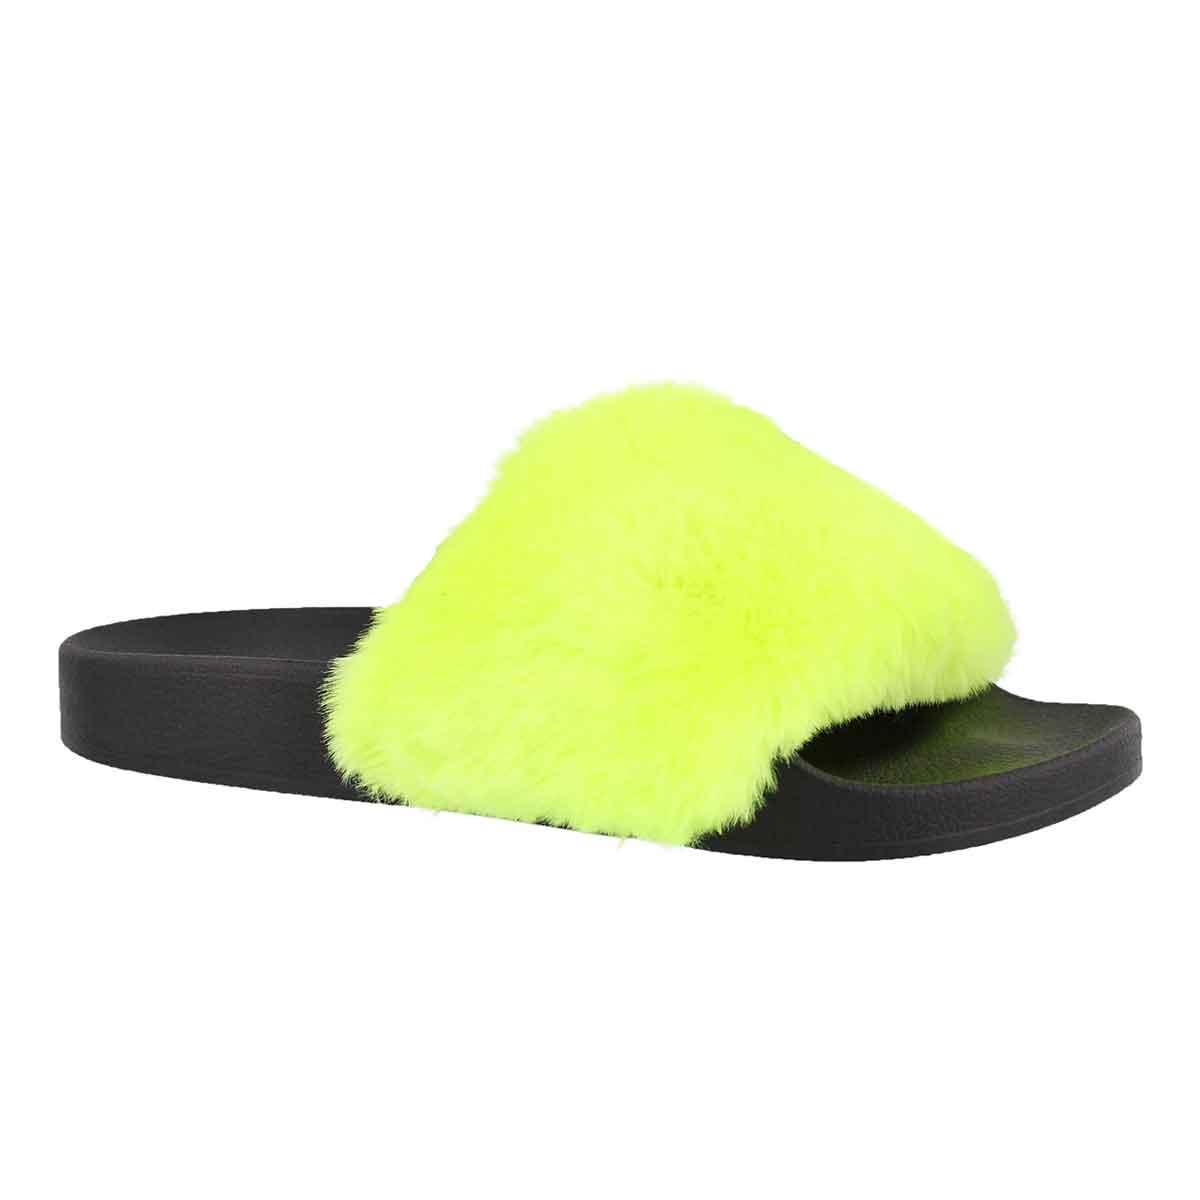 Women's SOFTEY yellow fur slide sandals